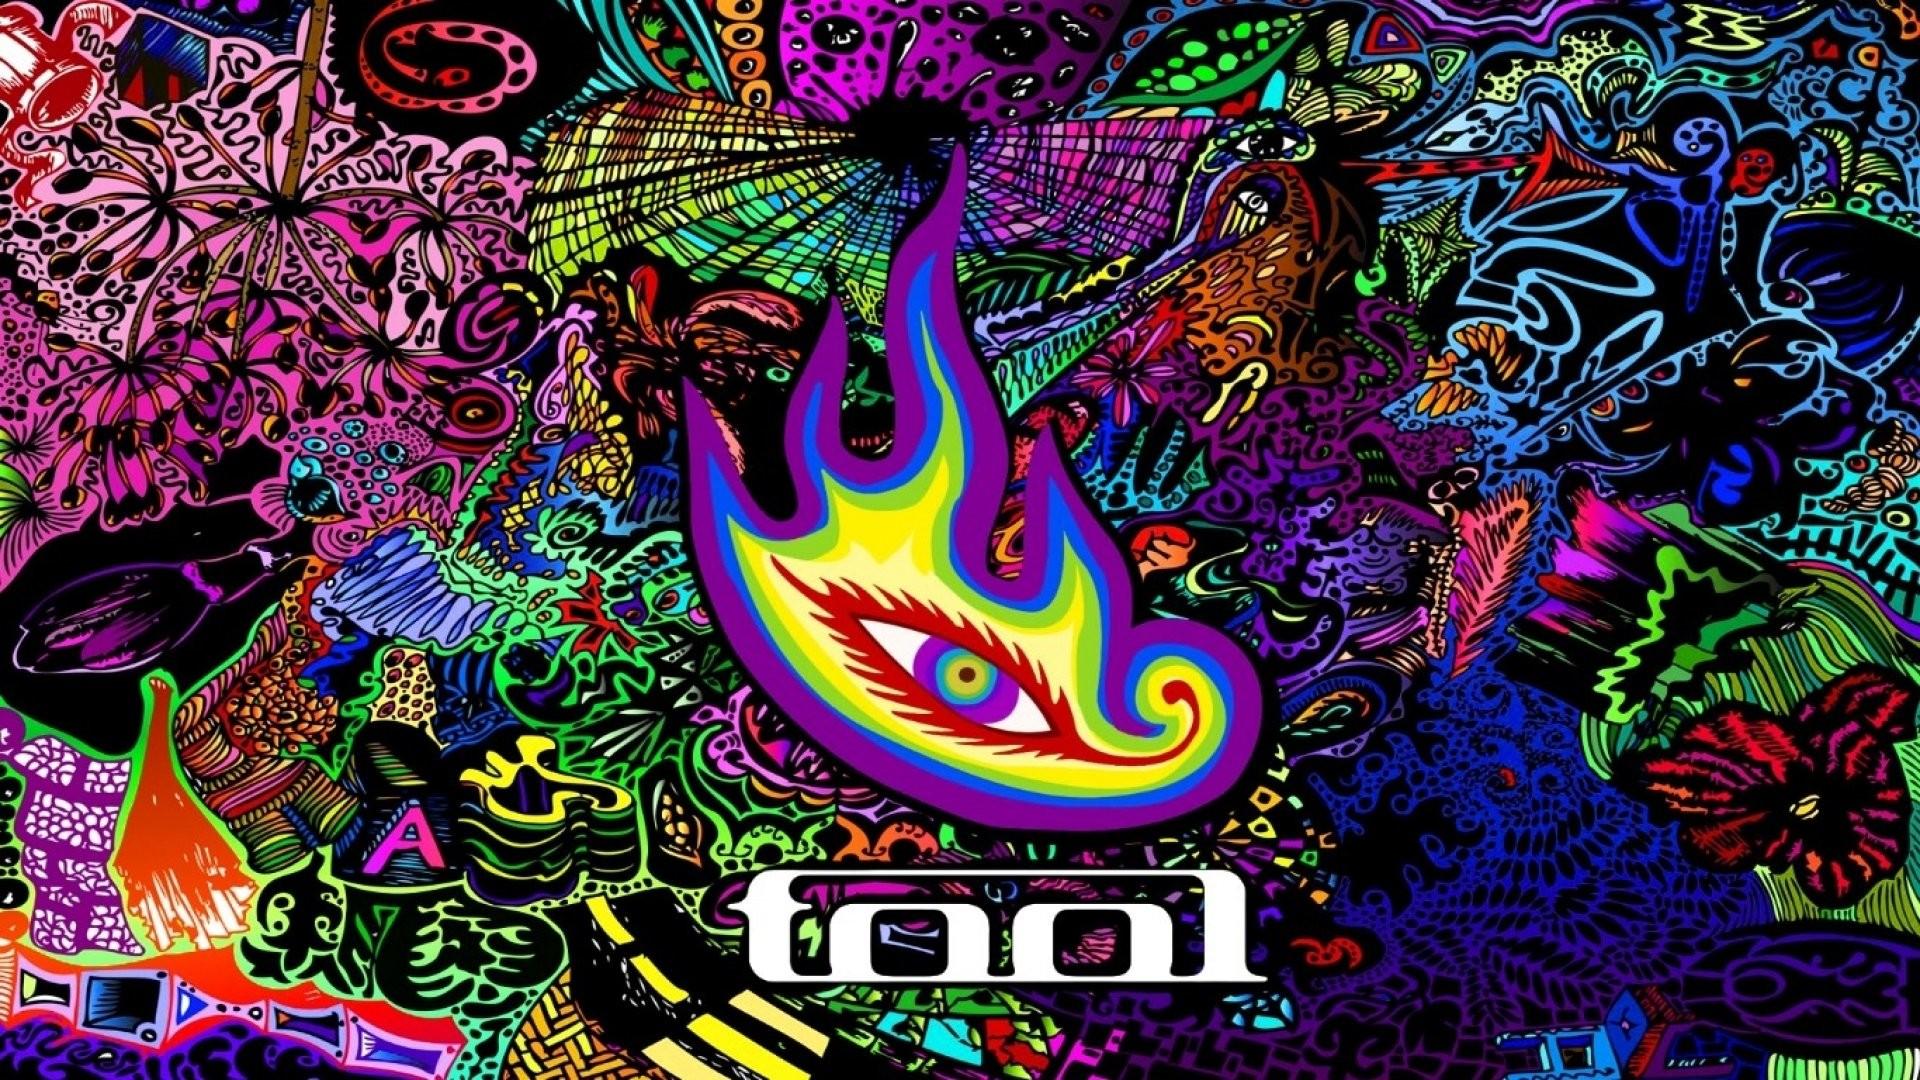 TOOL alternative metal rock nu-metal psychedelic wallpaper | |  549750 | WallpaperUP